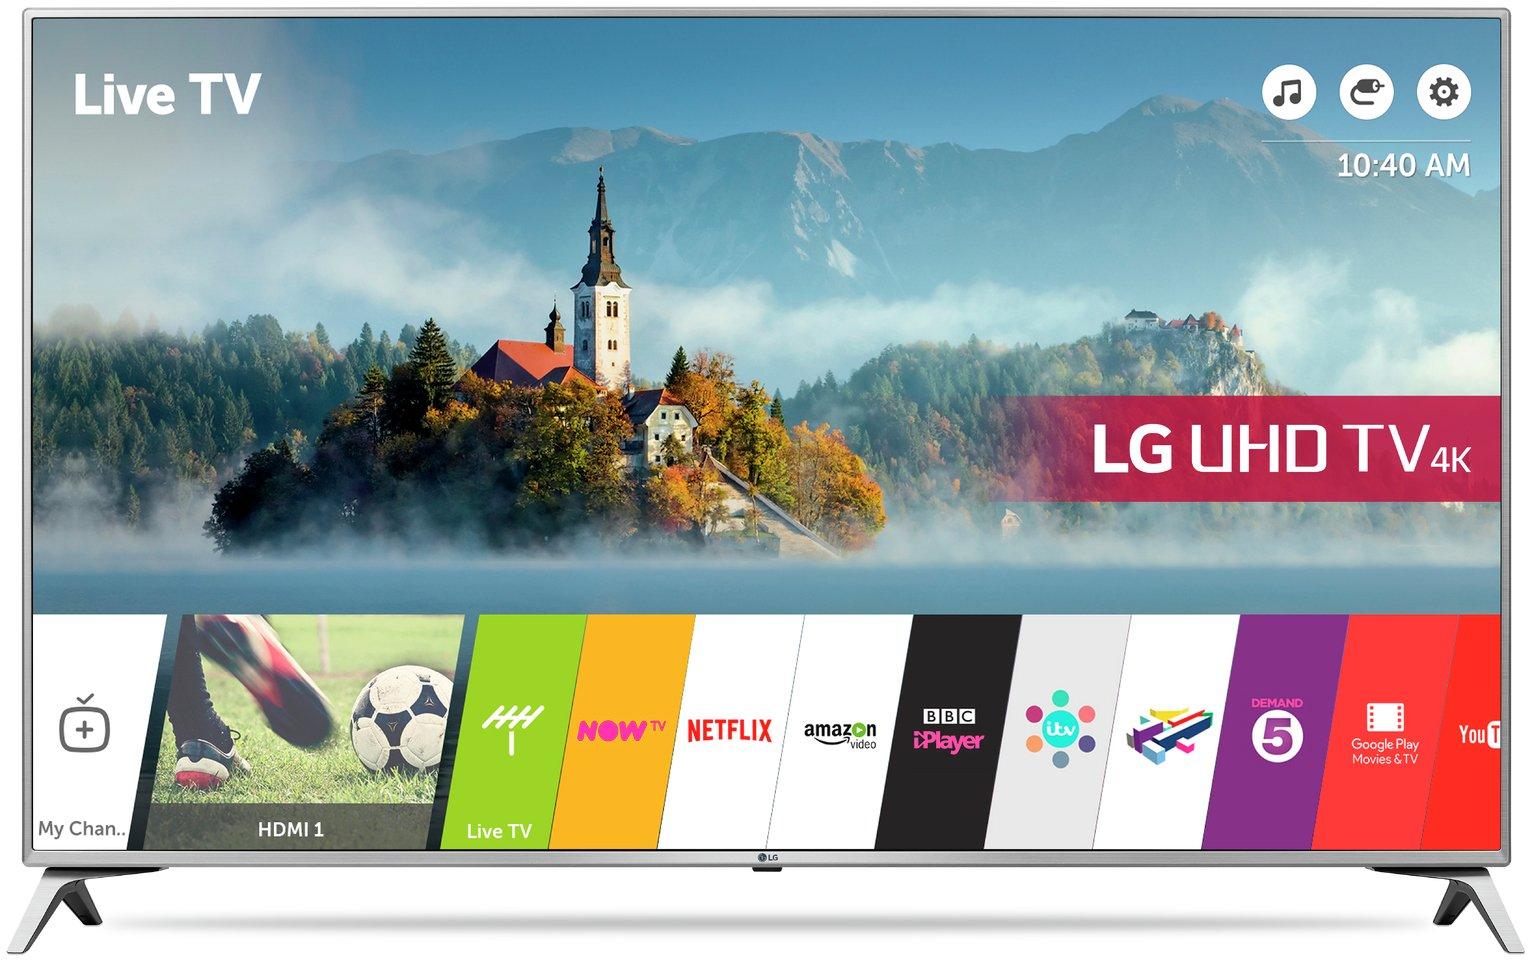 LG 65UJ651V 65 Inch SMART 4K Ultra HD TV with HDR.